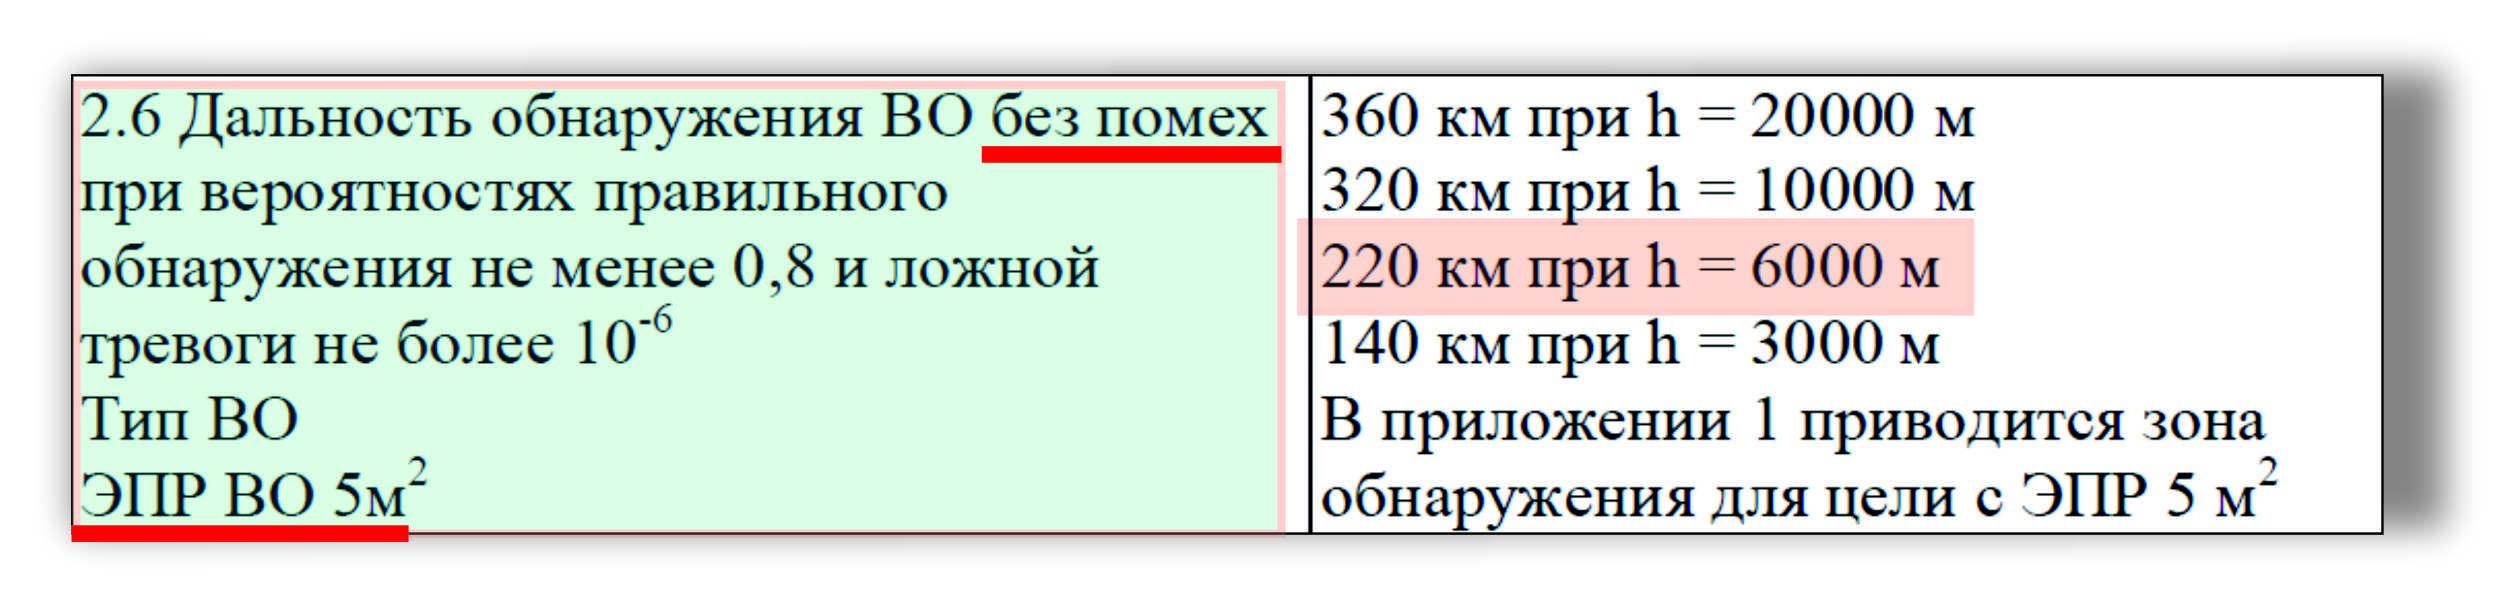 http://images.vfl.ru/ii/1618912167/78733684/34150640.jpg